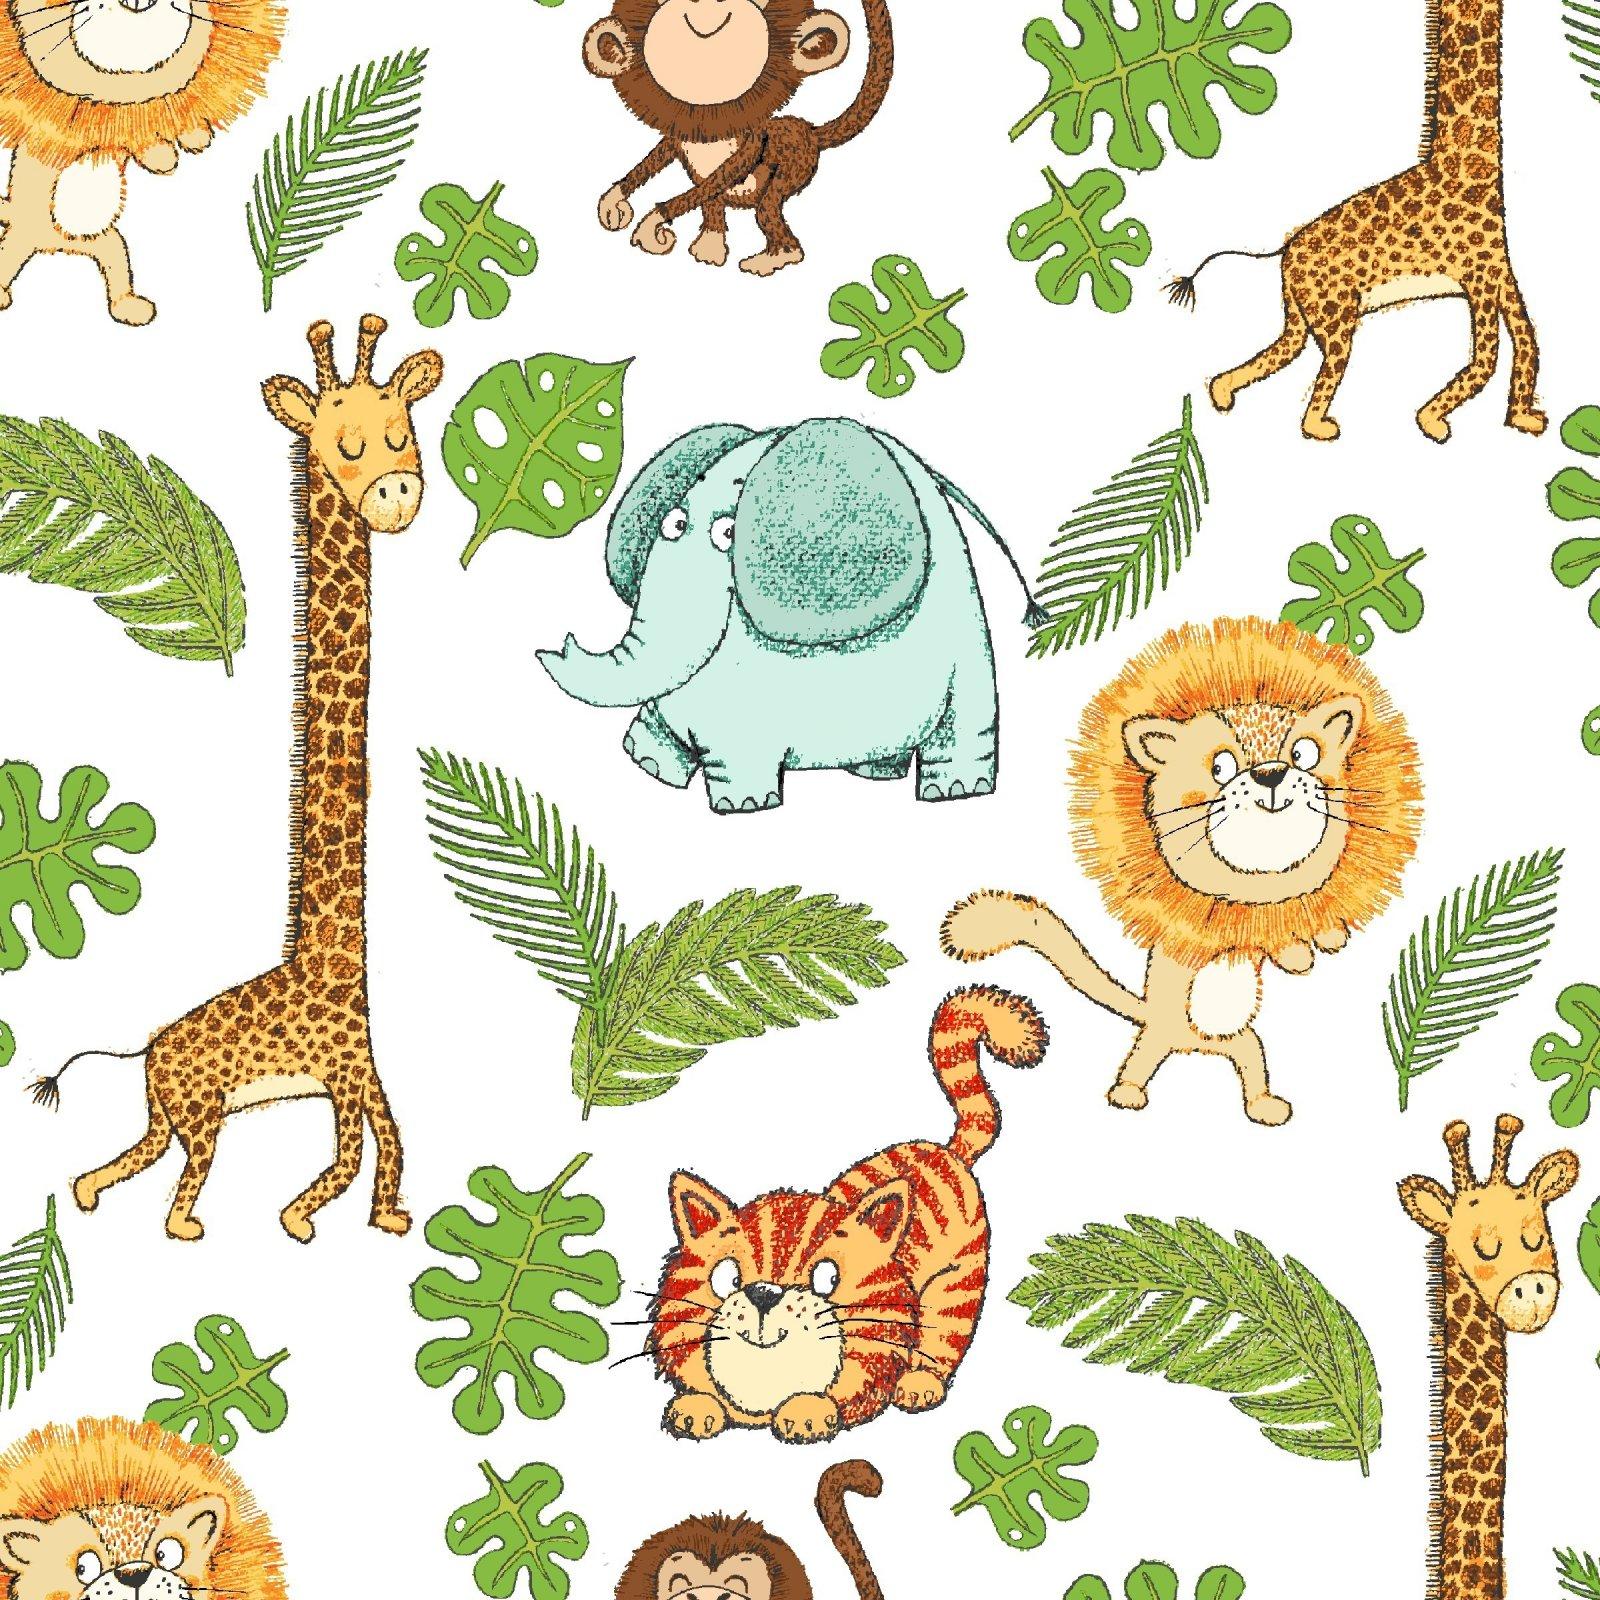 FE-Playful Cuties 4 14922 White - Safari Animals Flannel